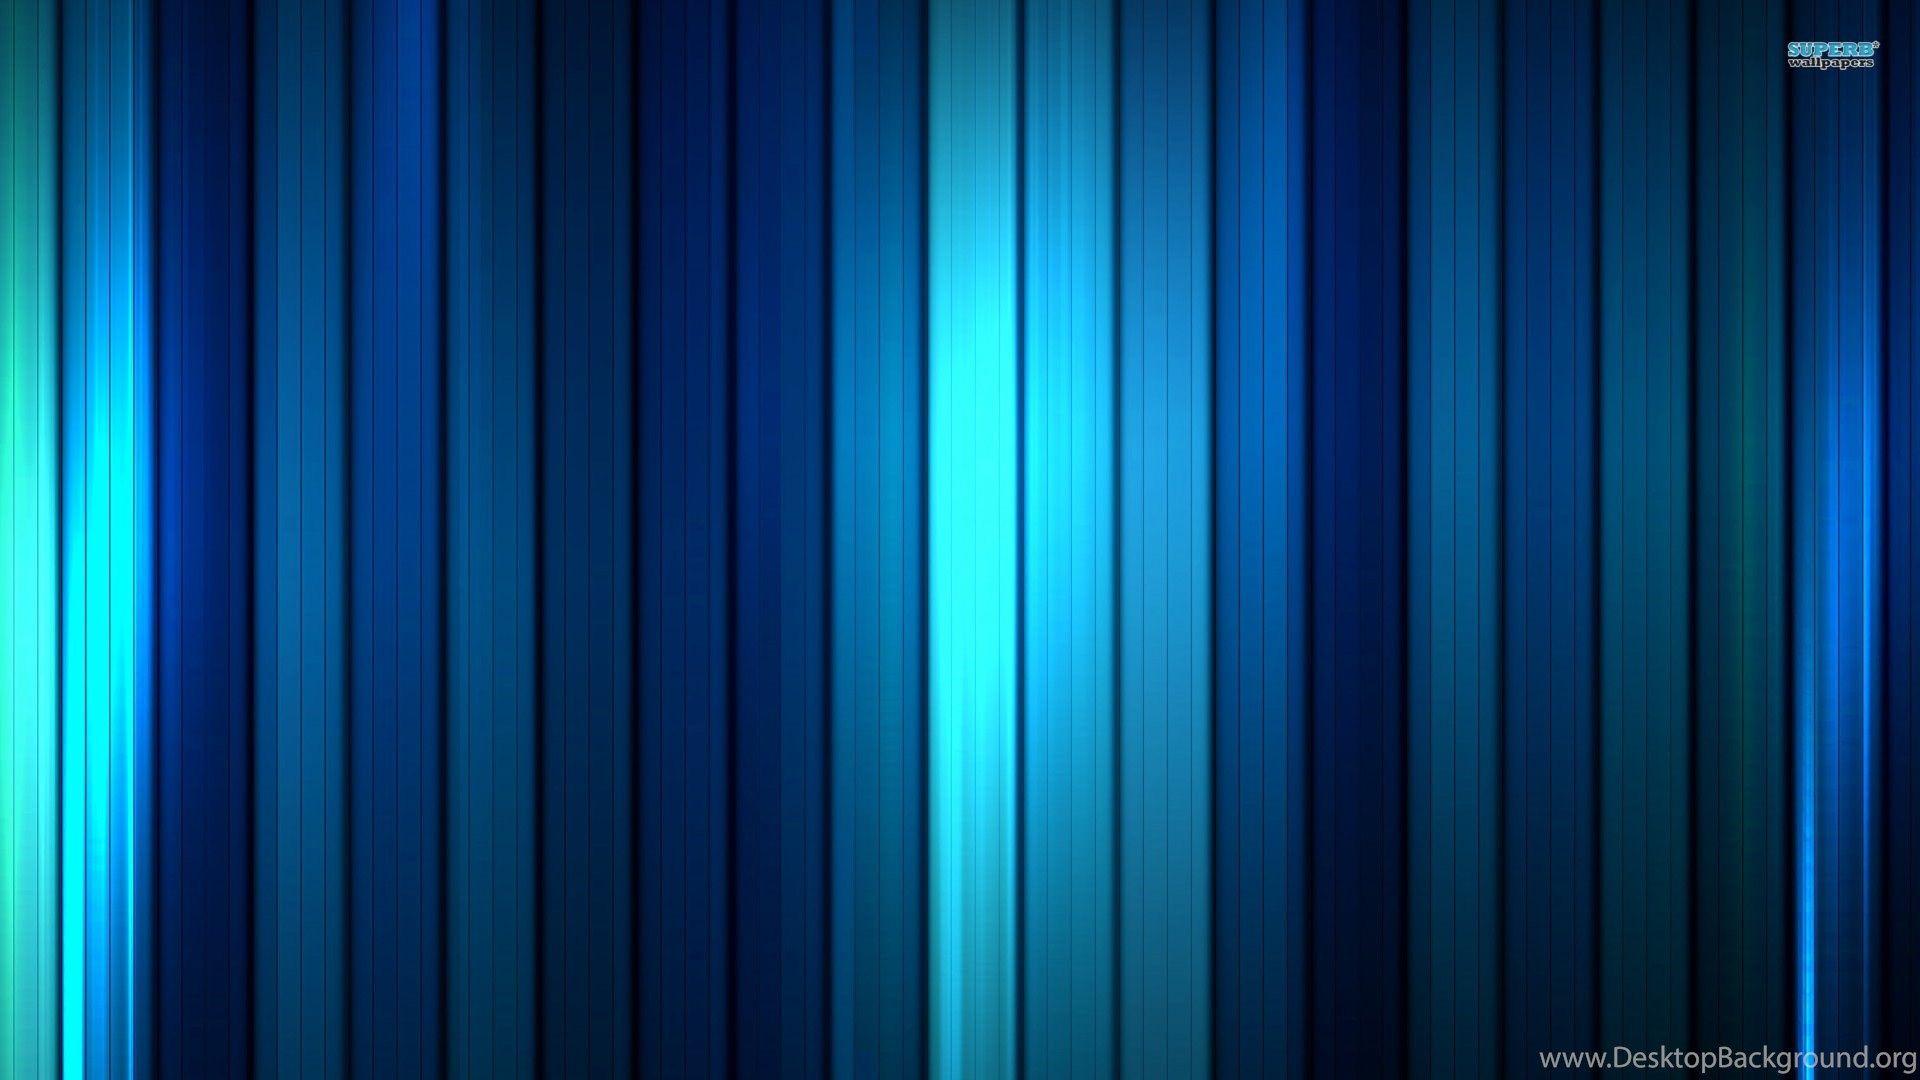 3K Wallpapers   Top 3K Backgrounds   WallpaperAccess 1920x1080